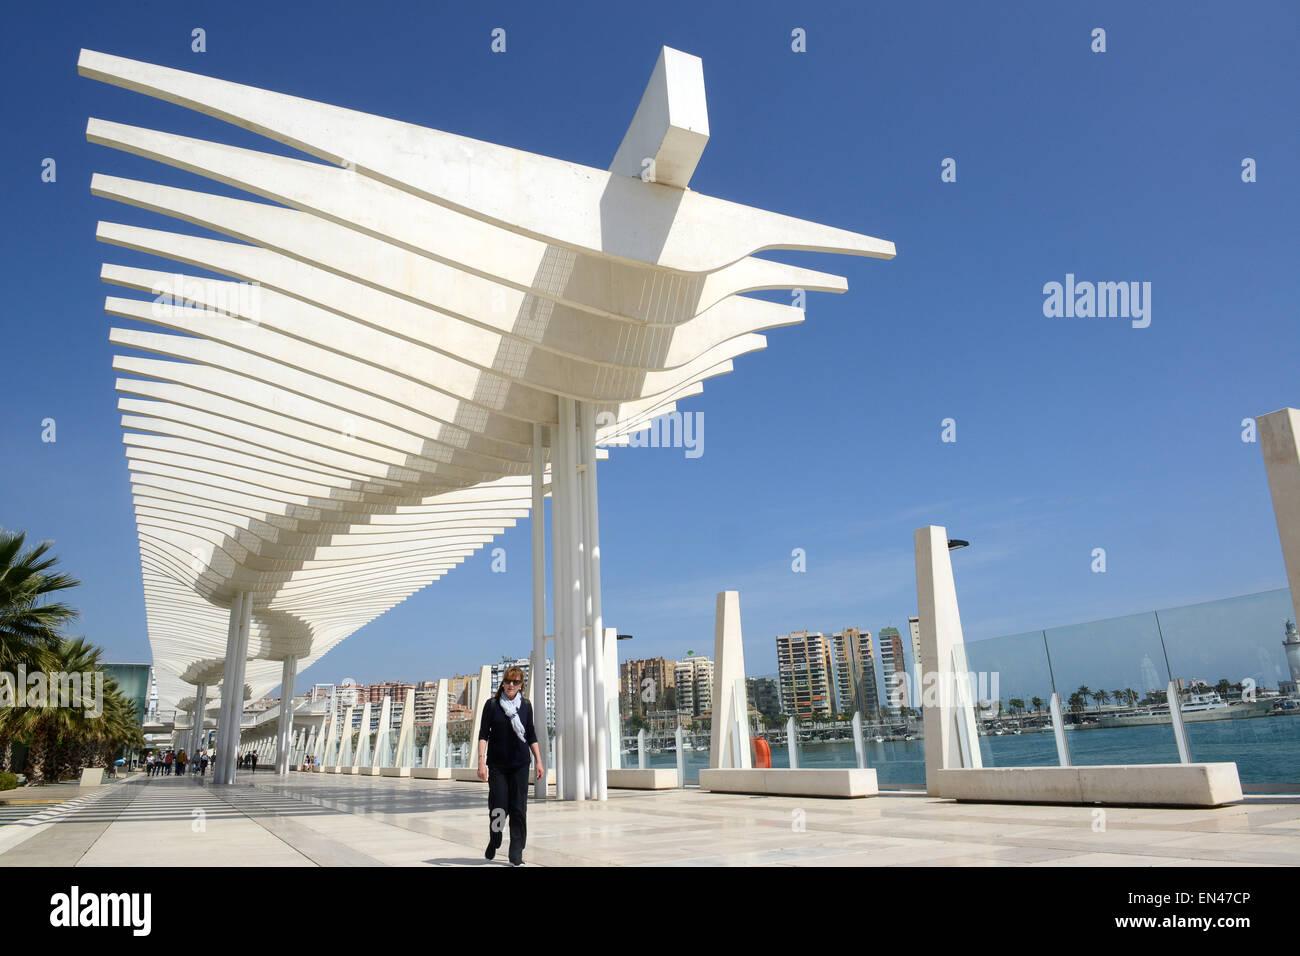 Malaga Promenade In Spanien Moderne Architektur